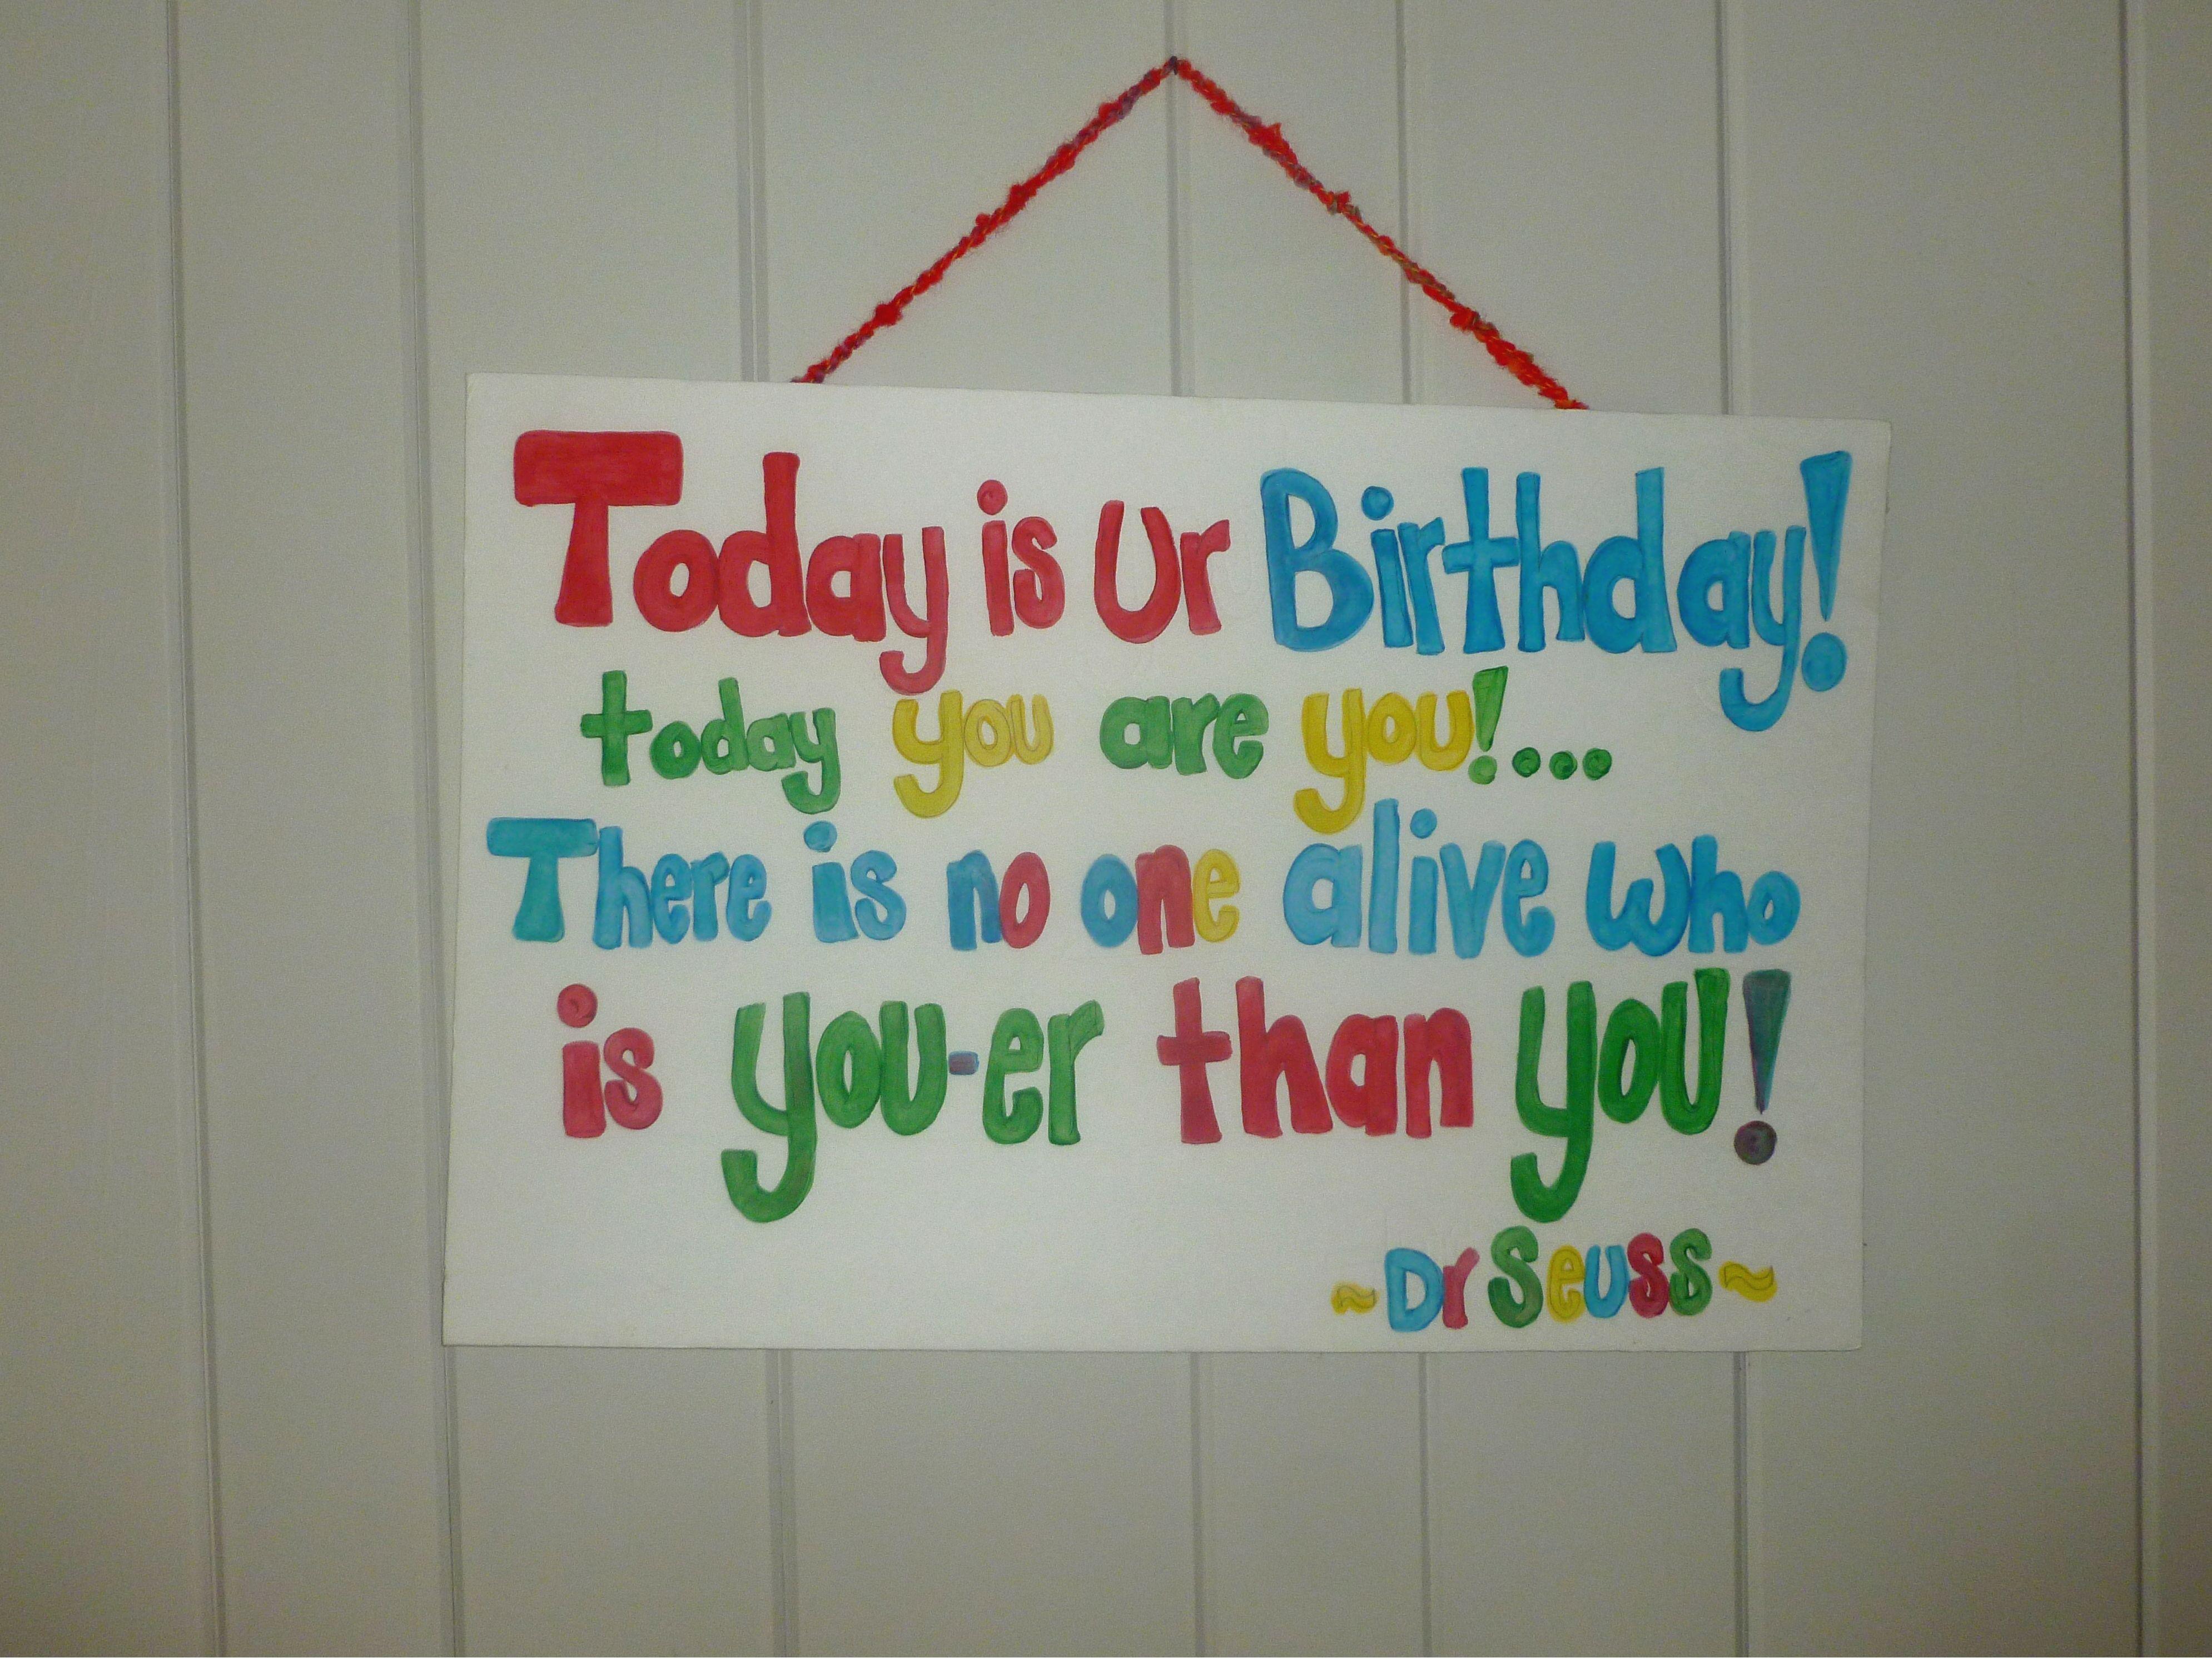 Dr seuss birthday poem dr seuss birthday birthday poems